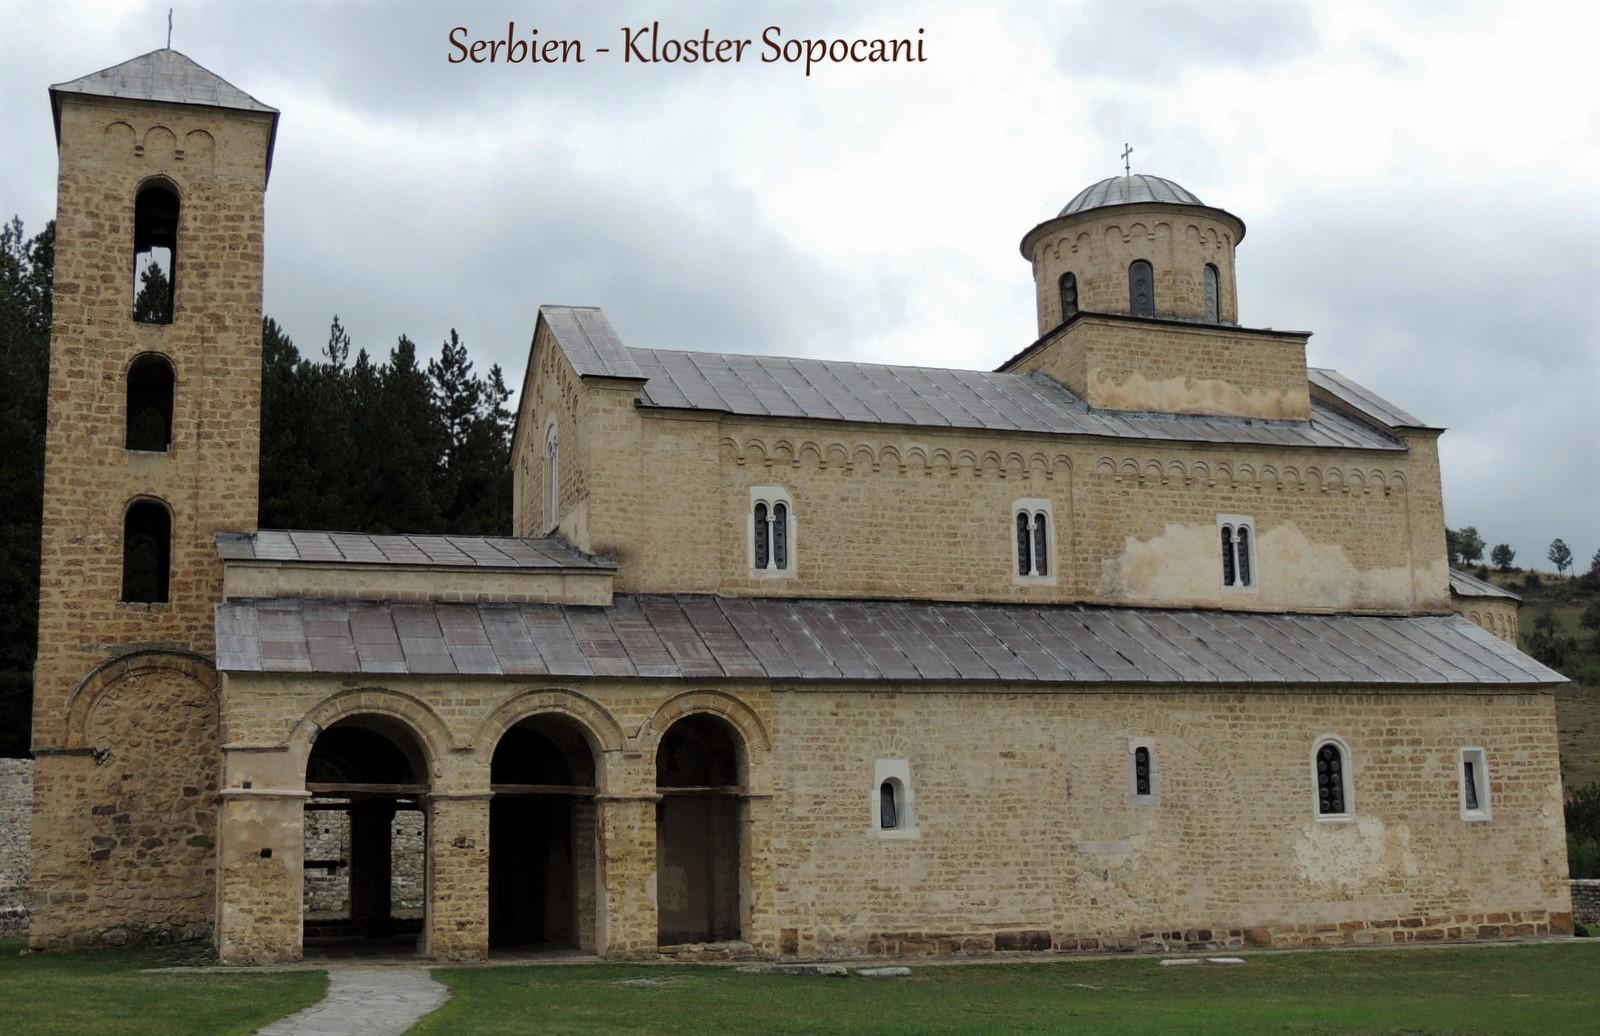 Kloster Sopocani - Serbien